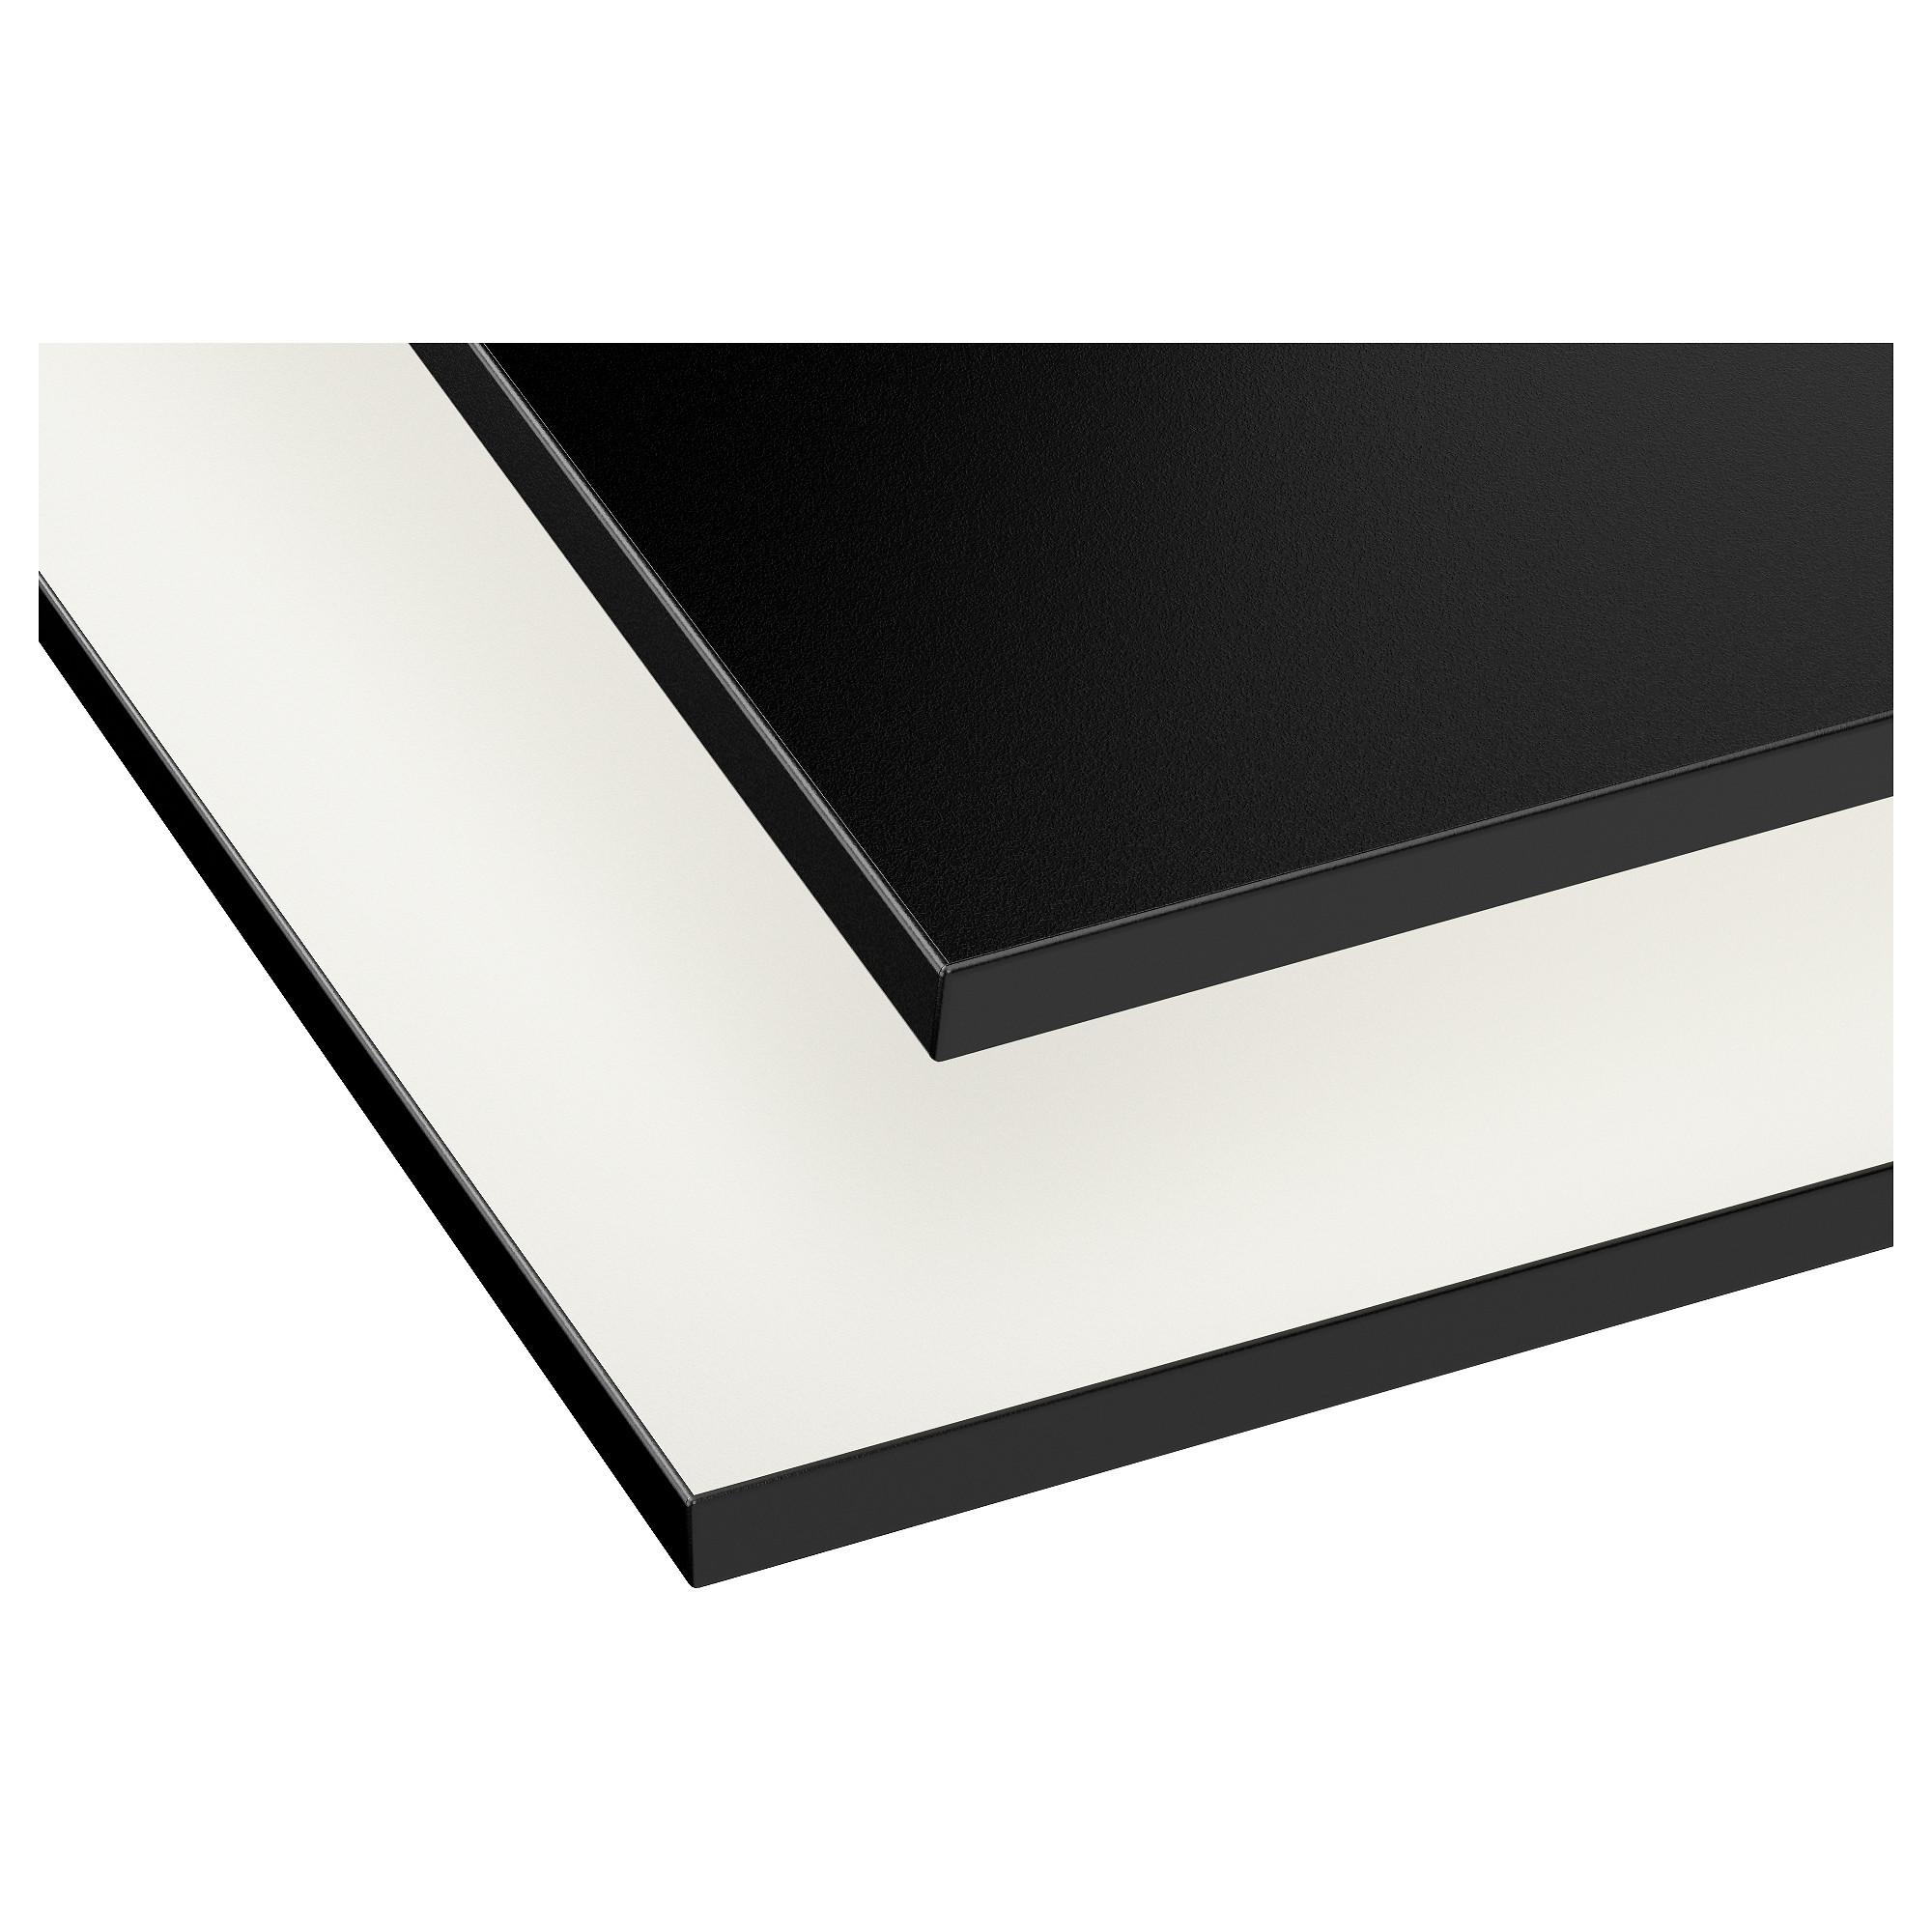 Столешница, двусторонняя ГОТШЭР артикуль № 803.693.91 в наличии. Online каталог IKEA РБ. Недорогая доставка и соборка.